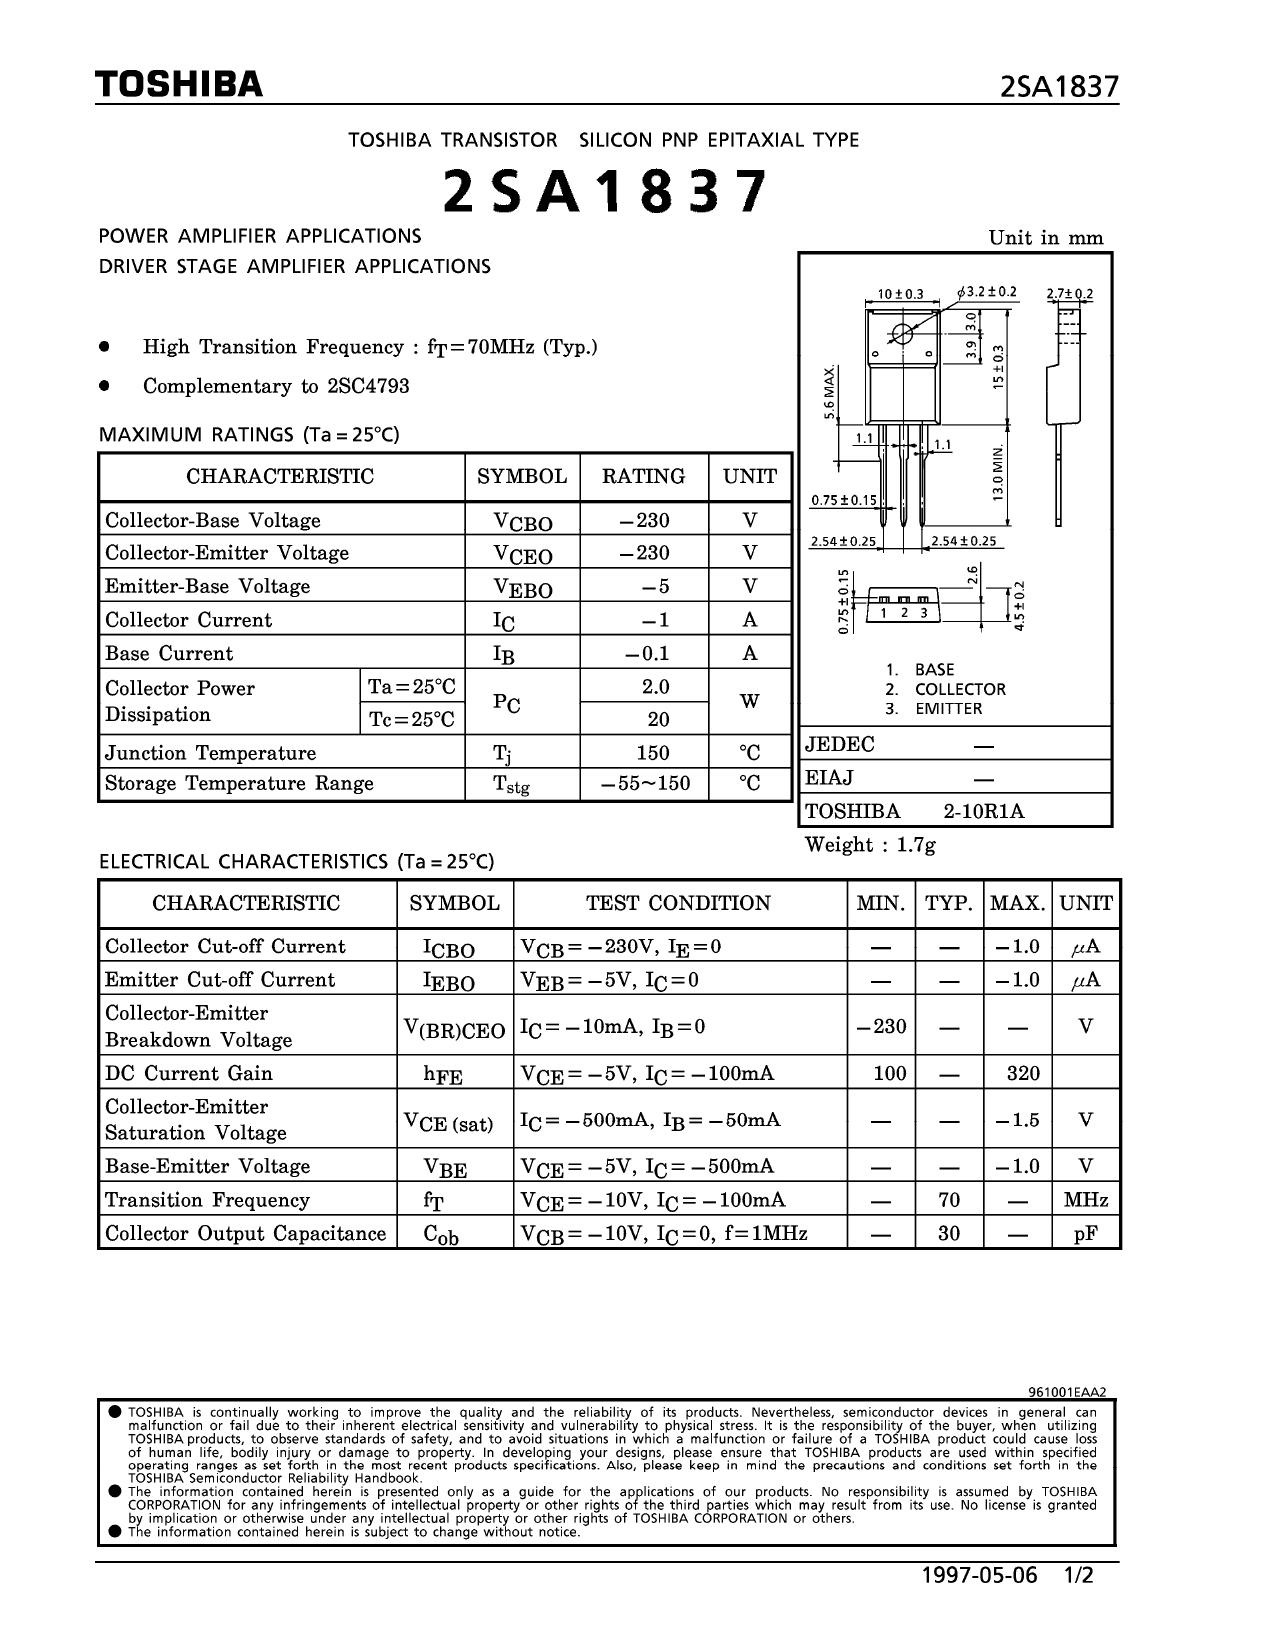 2SC1837 datasheet